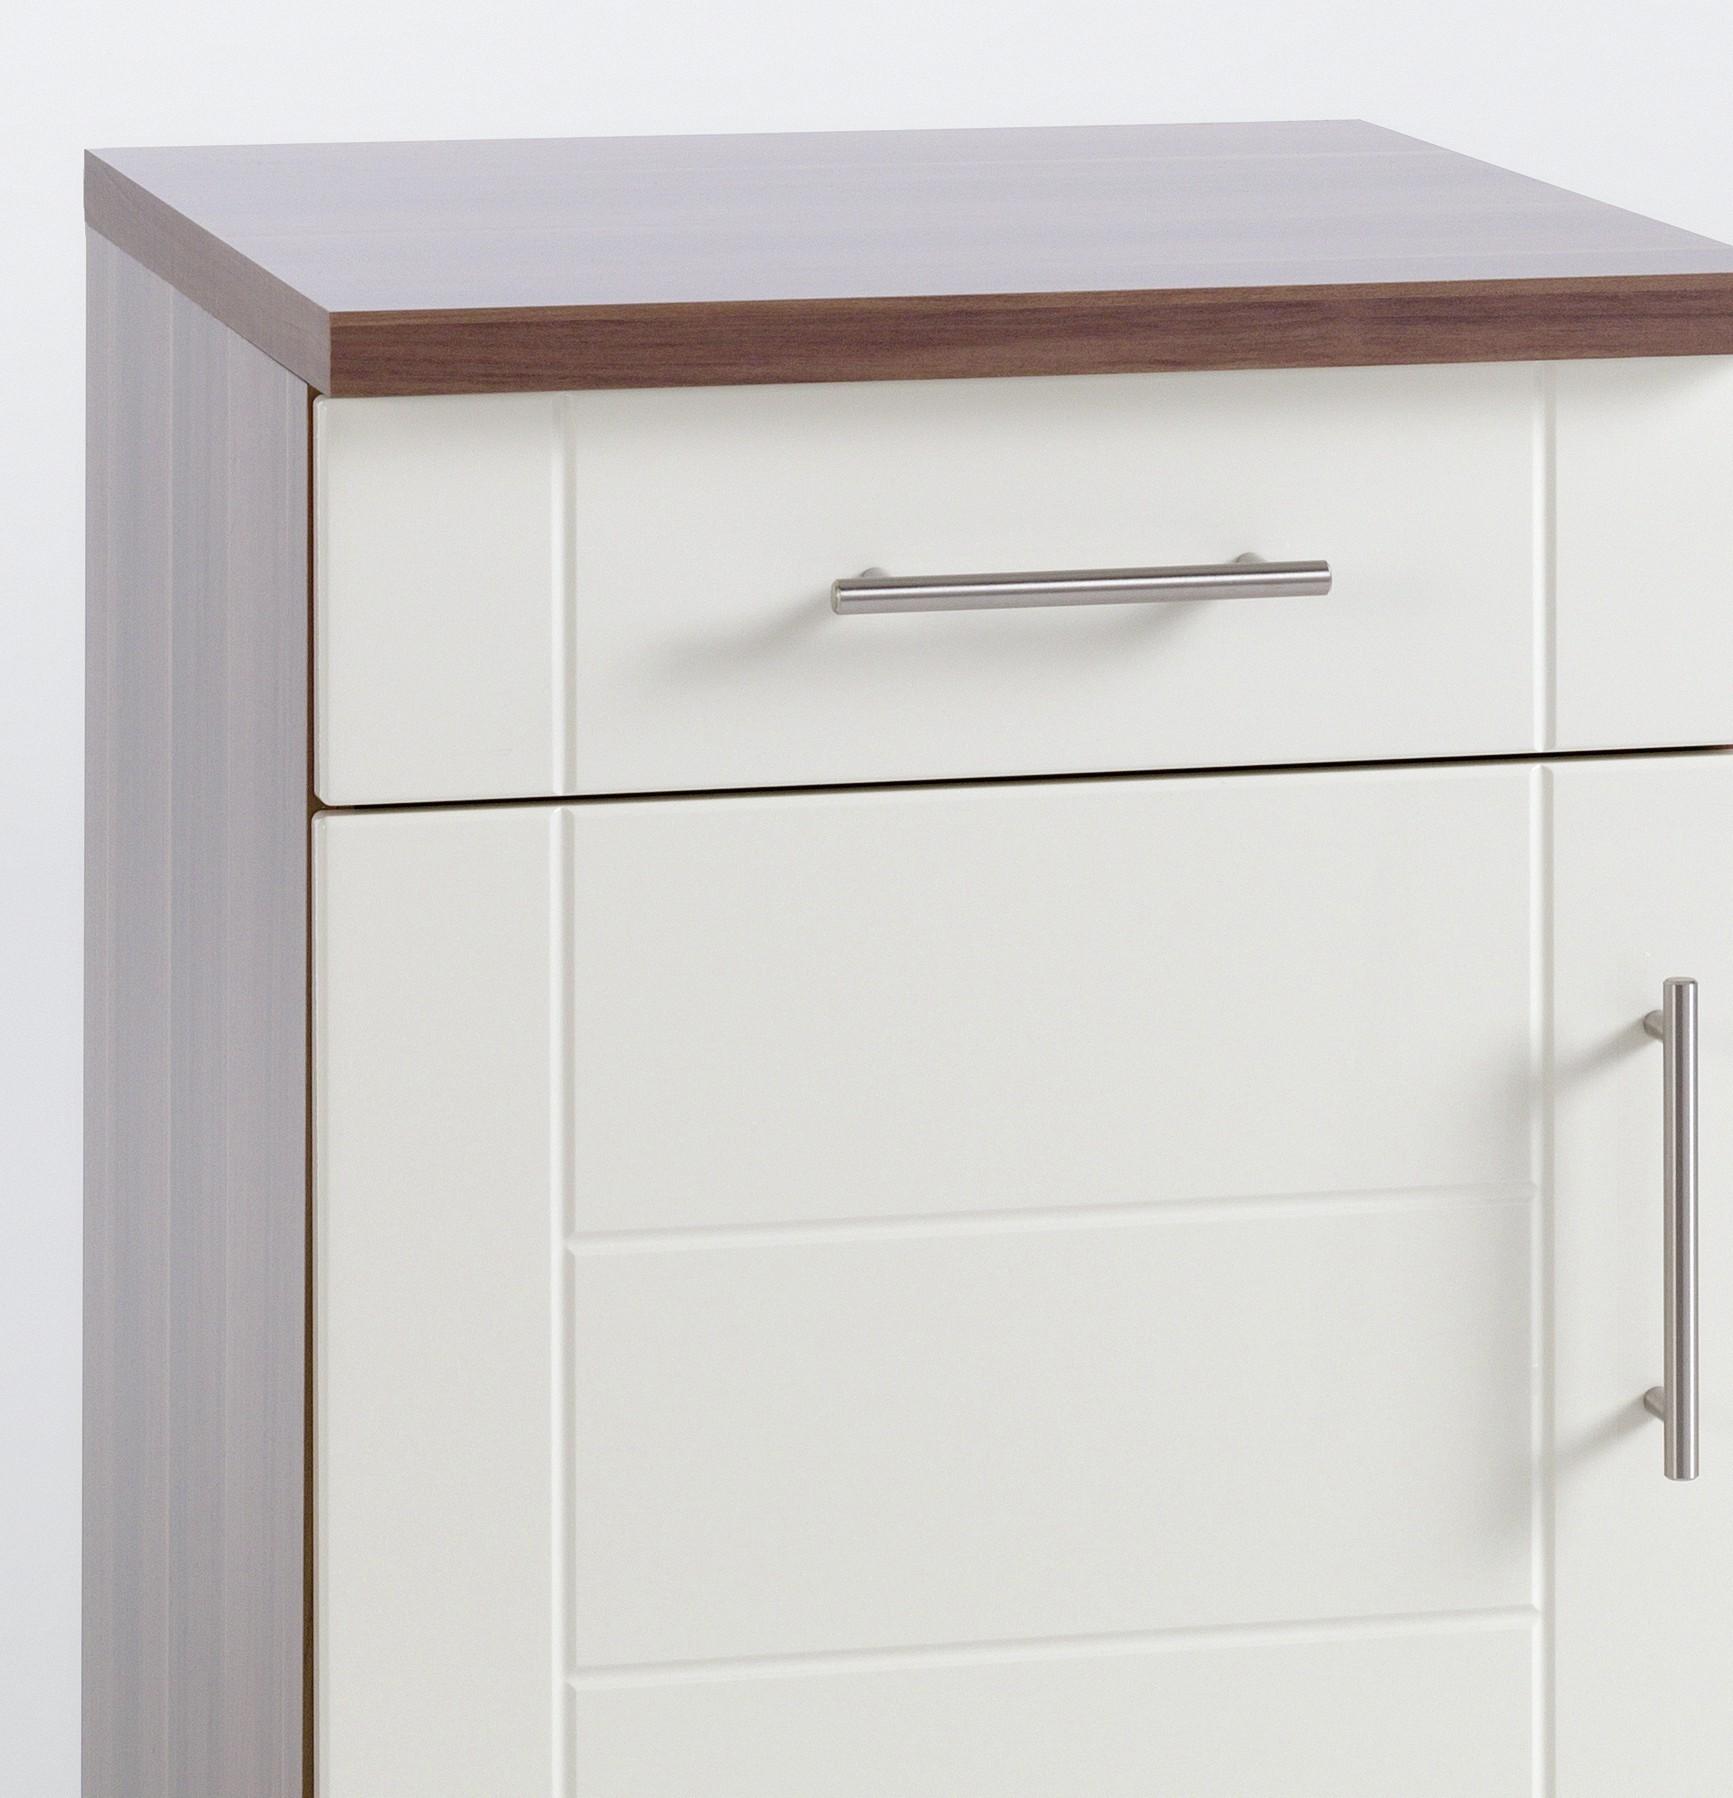 neu k chenzeile nevada k chenblock mit e ger ten 210 cm creme ebay. Black Bedroom Furniture Sets. Home Design Ideas